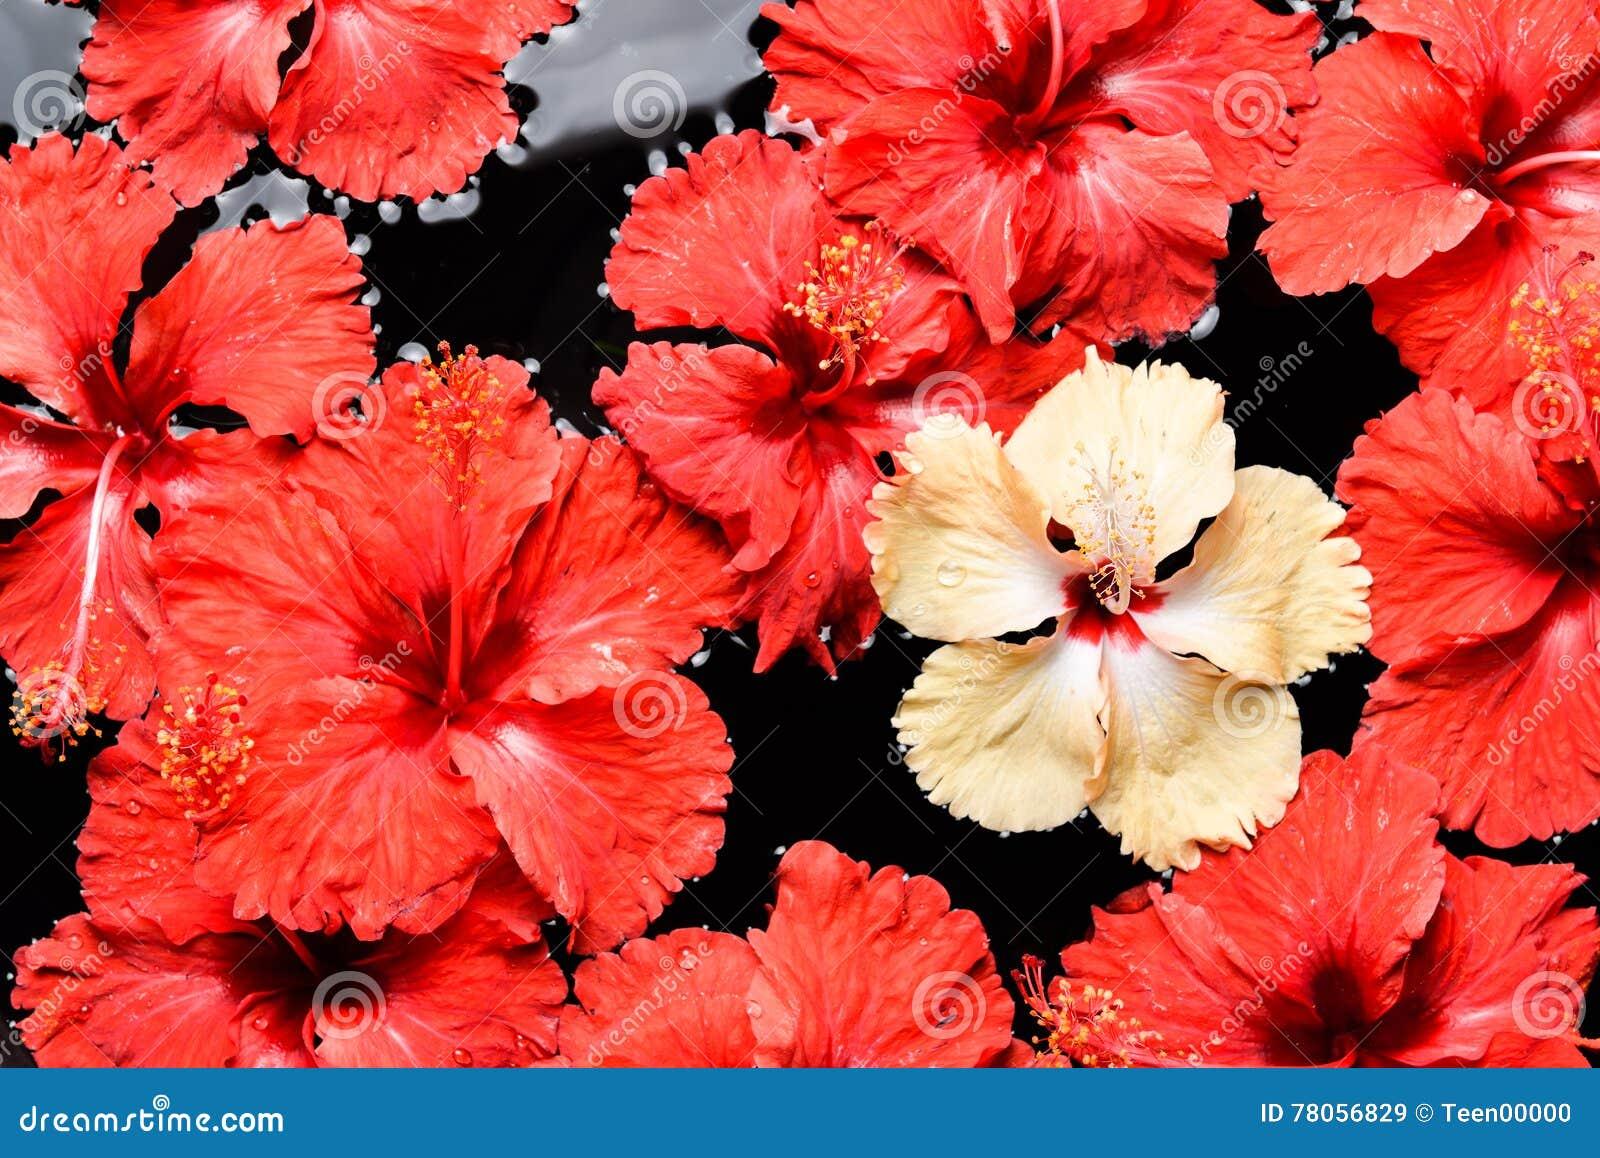 Spa wellness aromatherapy conceptbeautiful flowers in the stock spa wellness aromatherapy conceptbeautiful flowers in the water spa izmirmasajfo